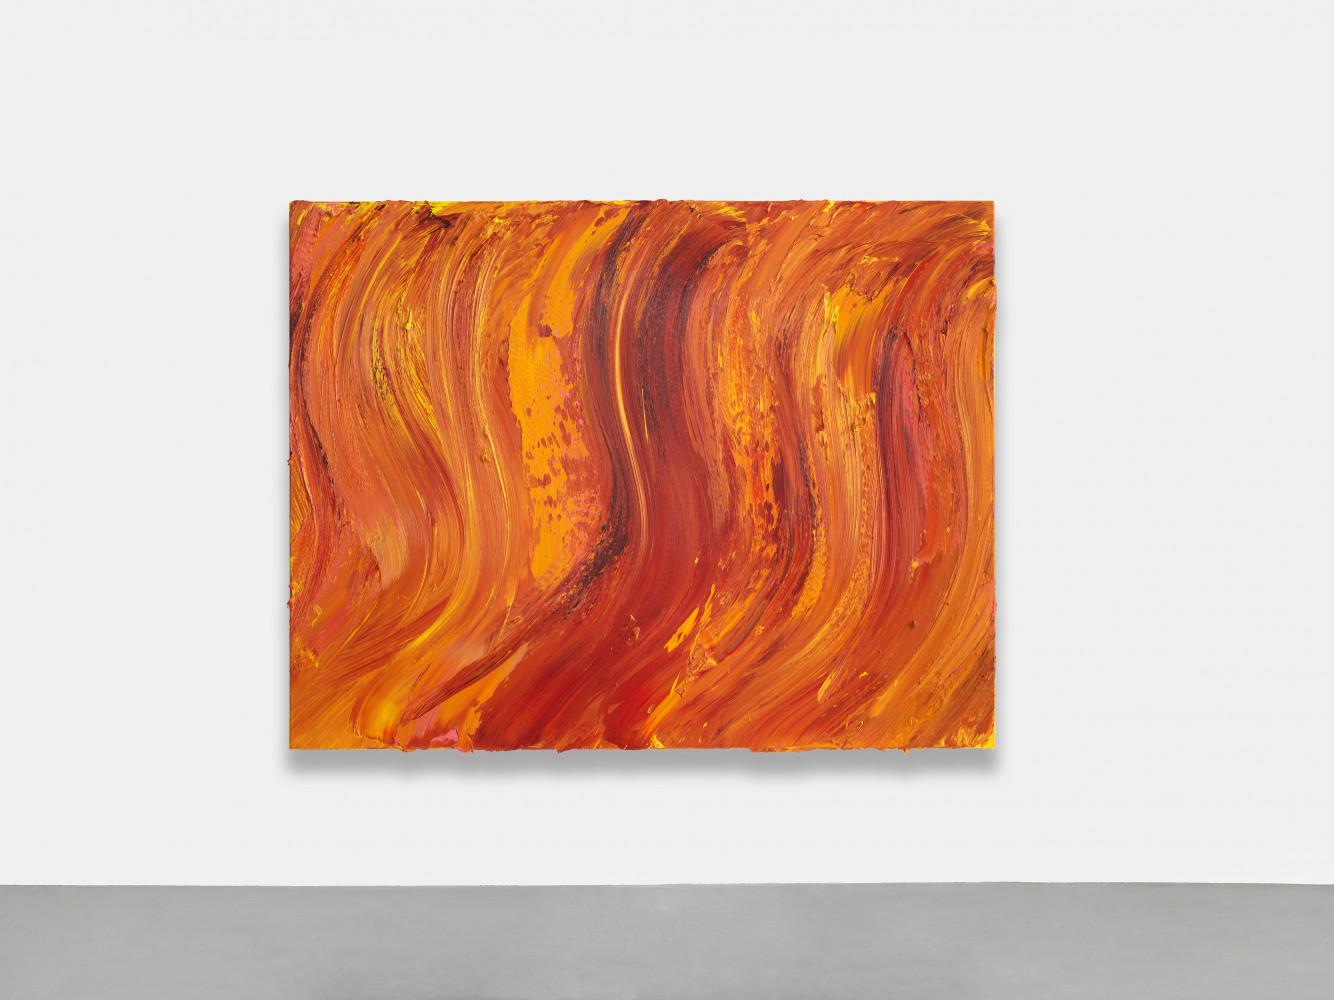 Jason Martin, 'Untitled (Old Holland gold lake / Permanent yellow light / Scarlet lake extra)', 2020